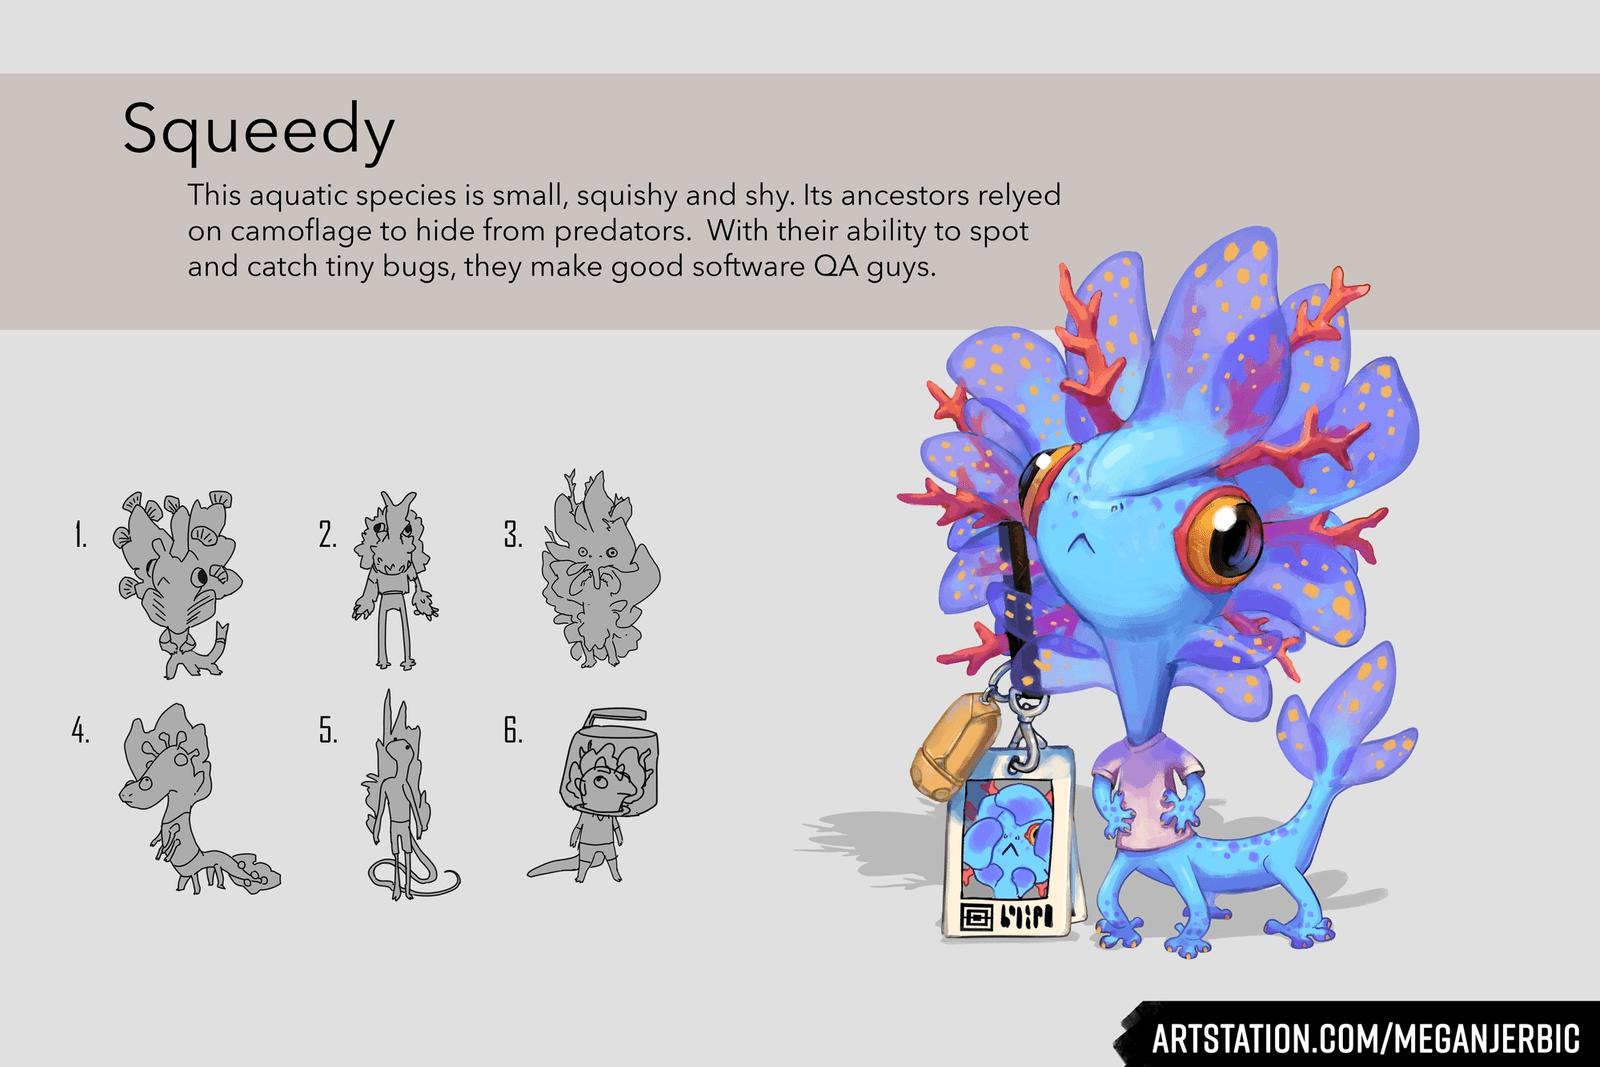 Squeedy